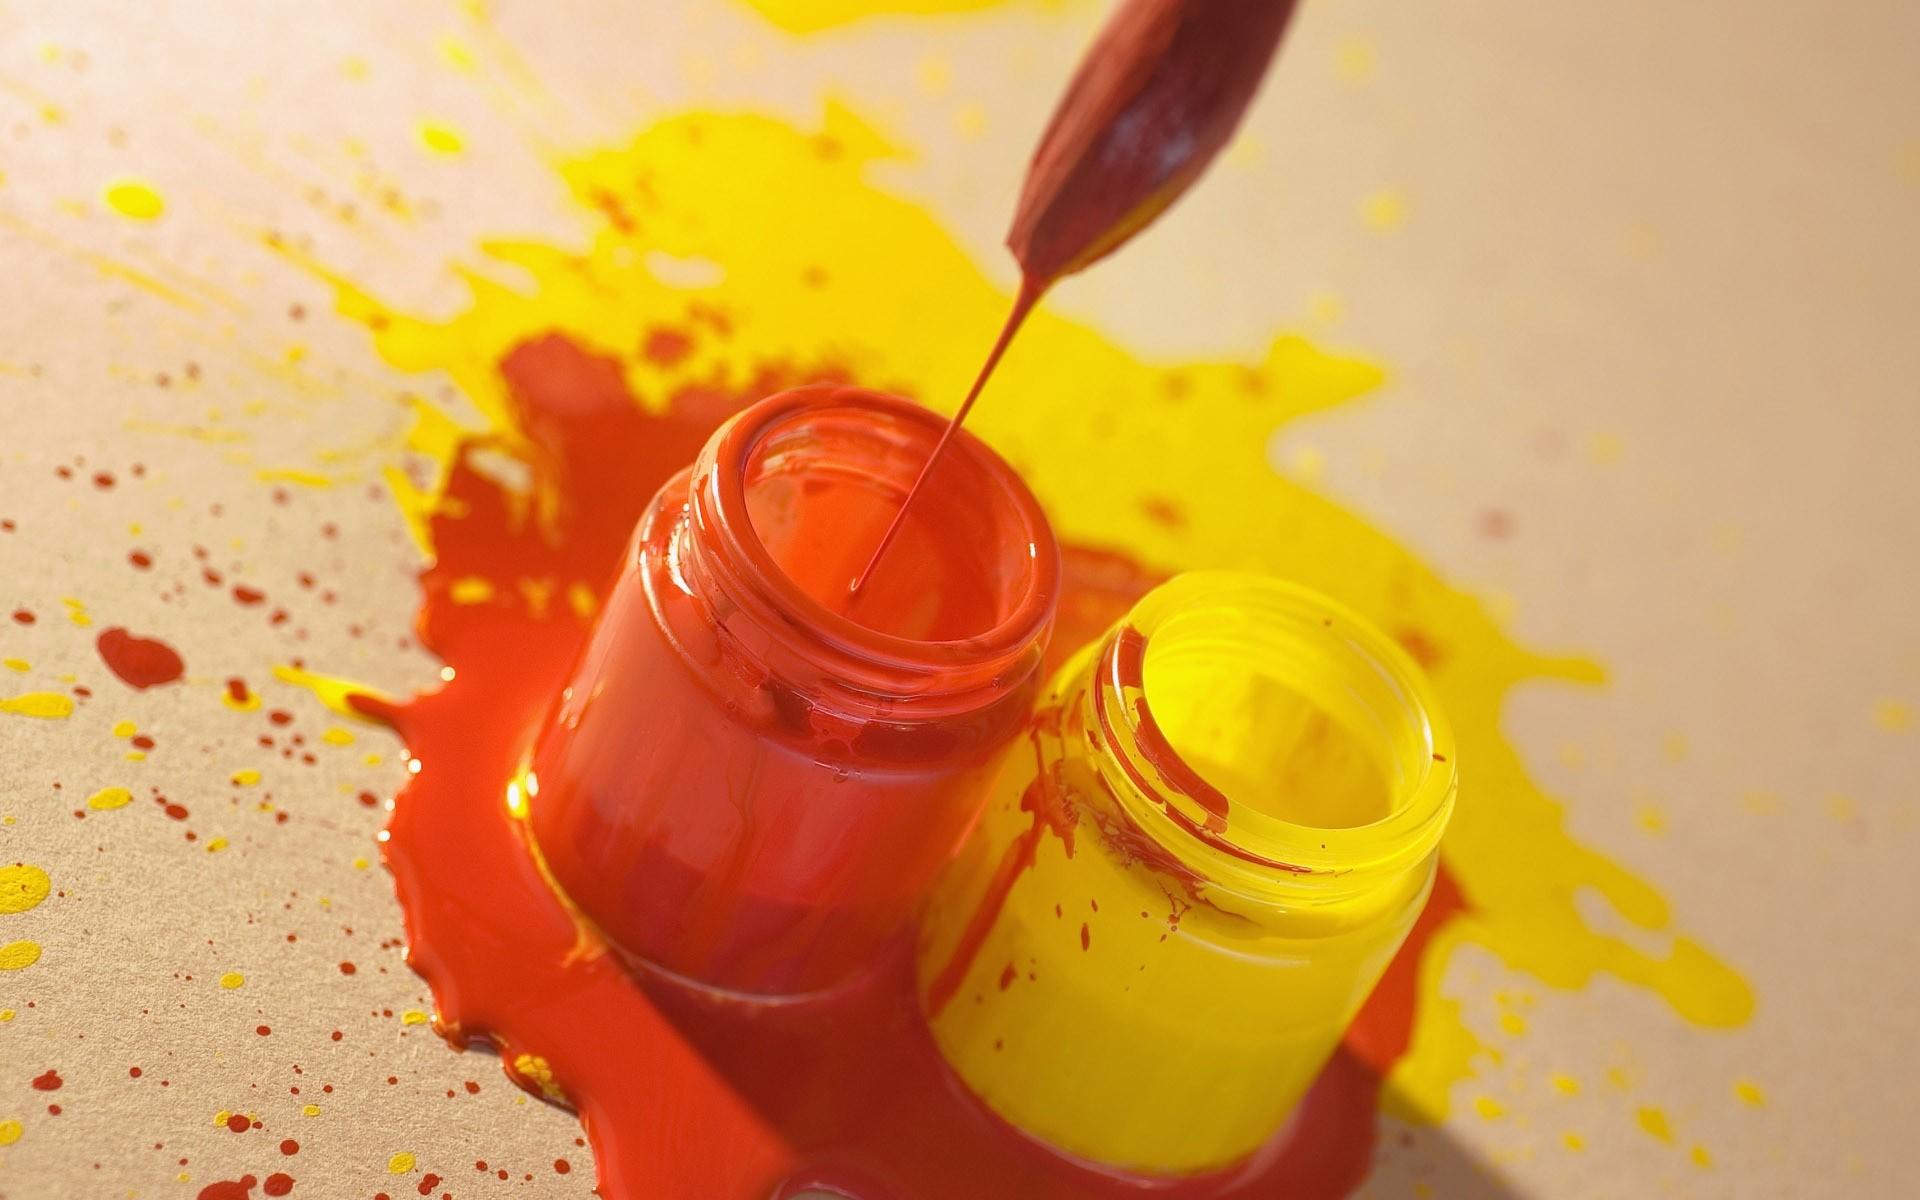 Wallpaper paint, bank, brush, red, yellow